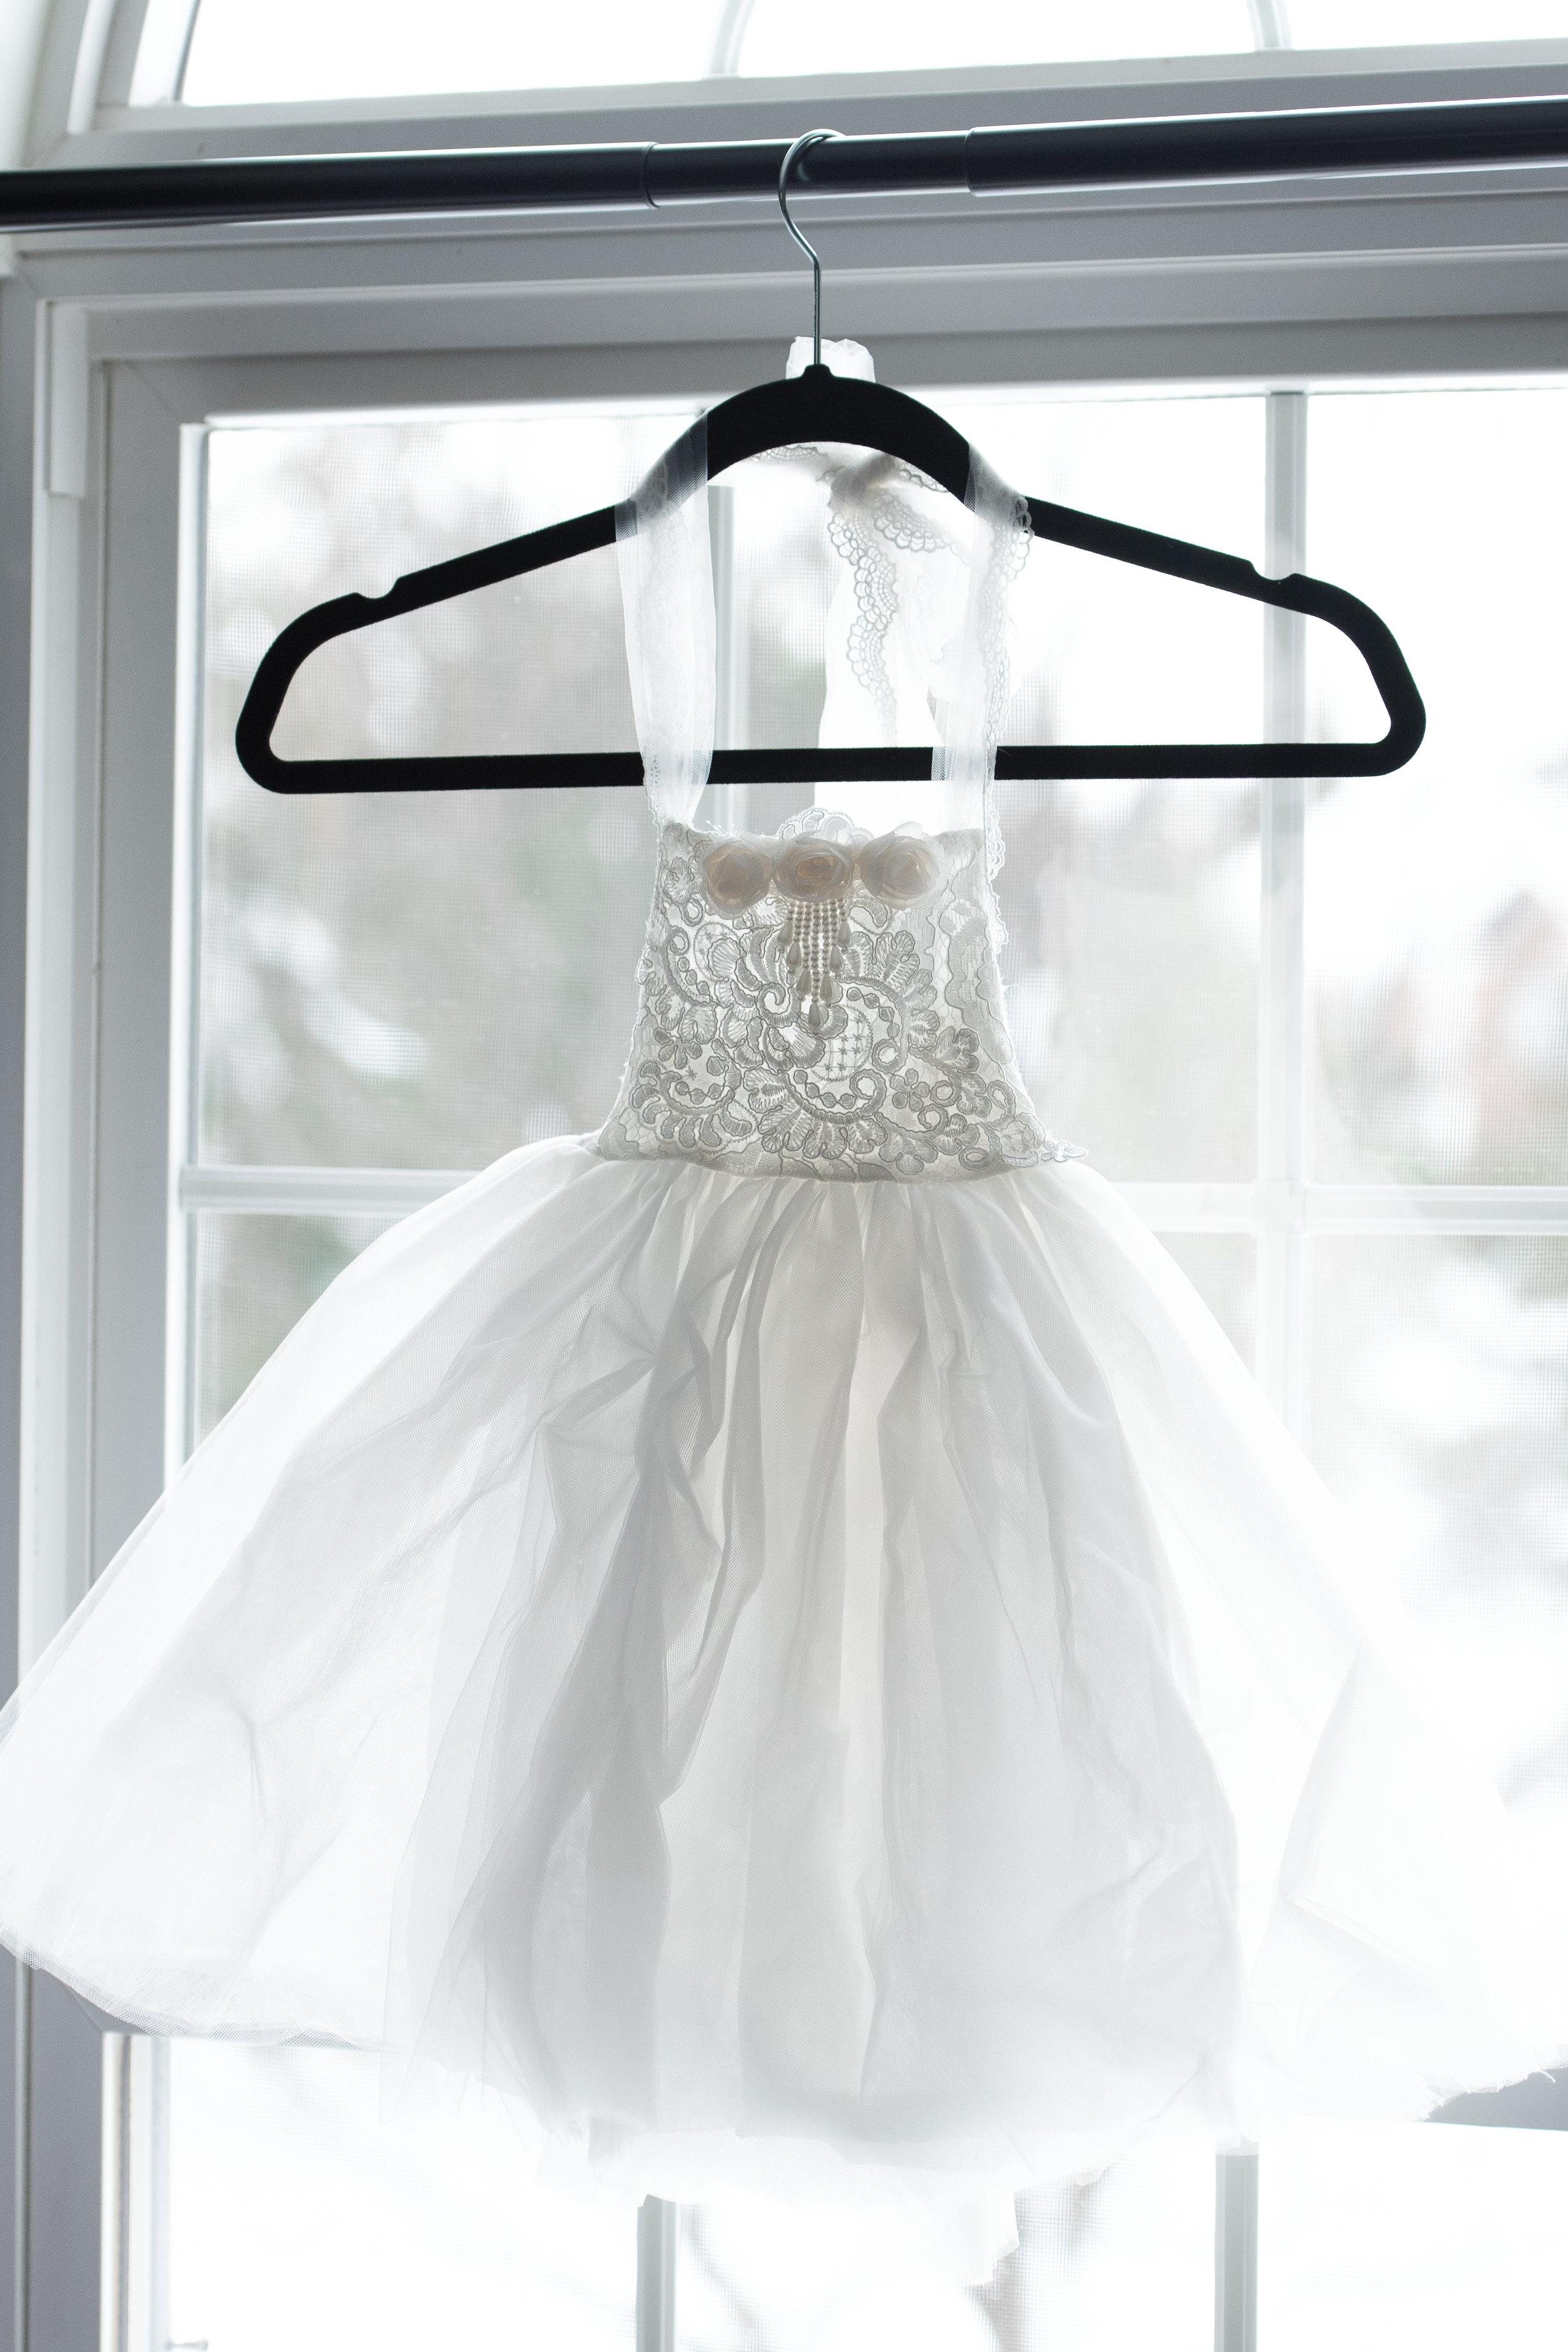 Dollcake Baby Dress